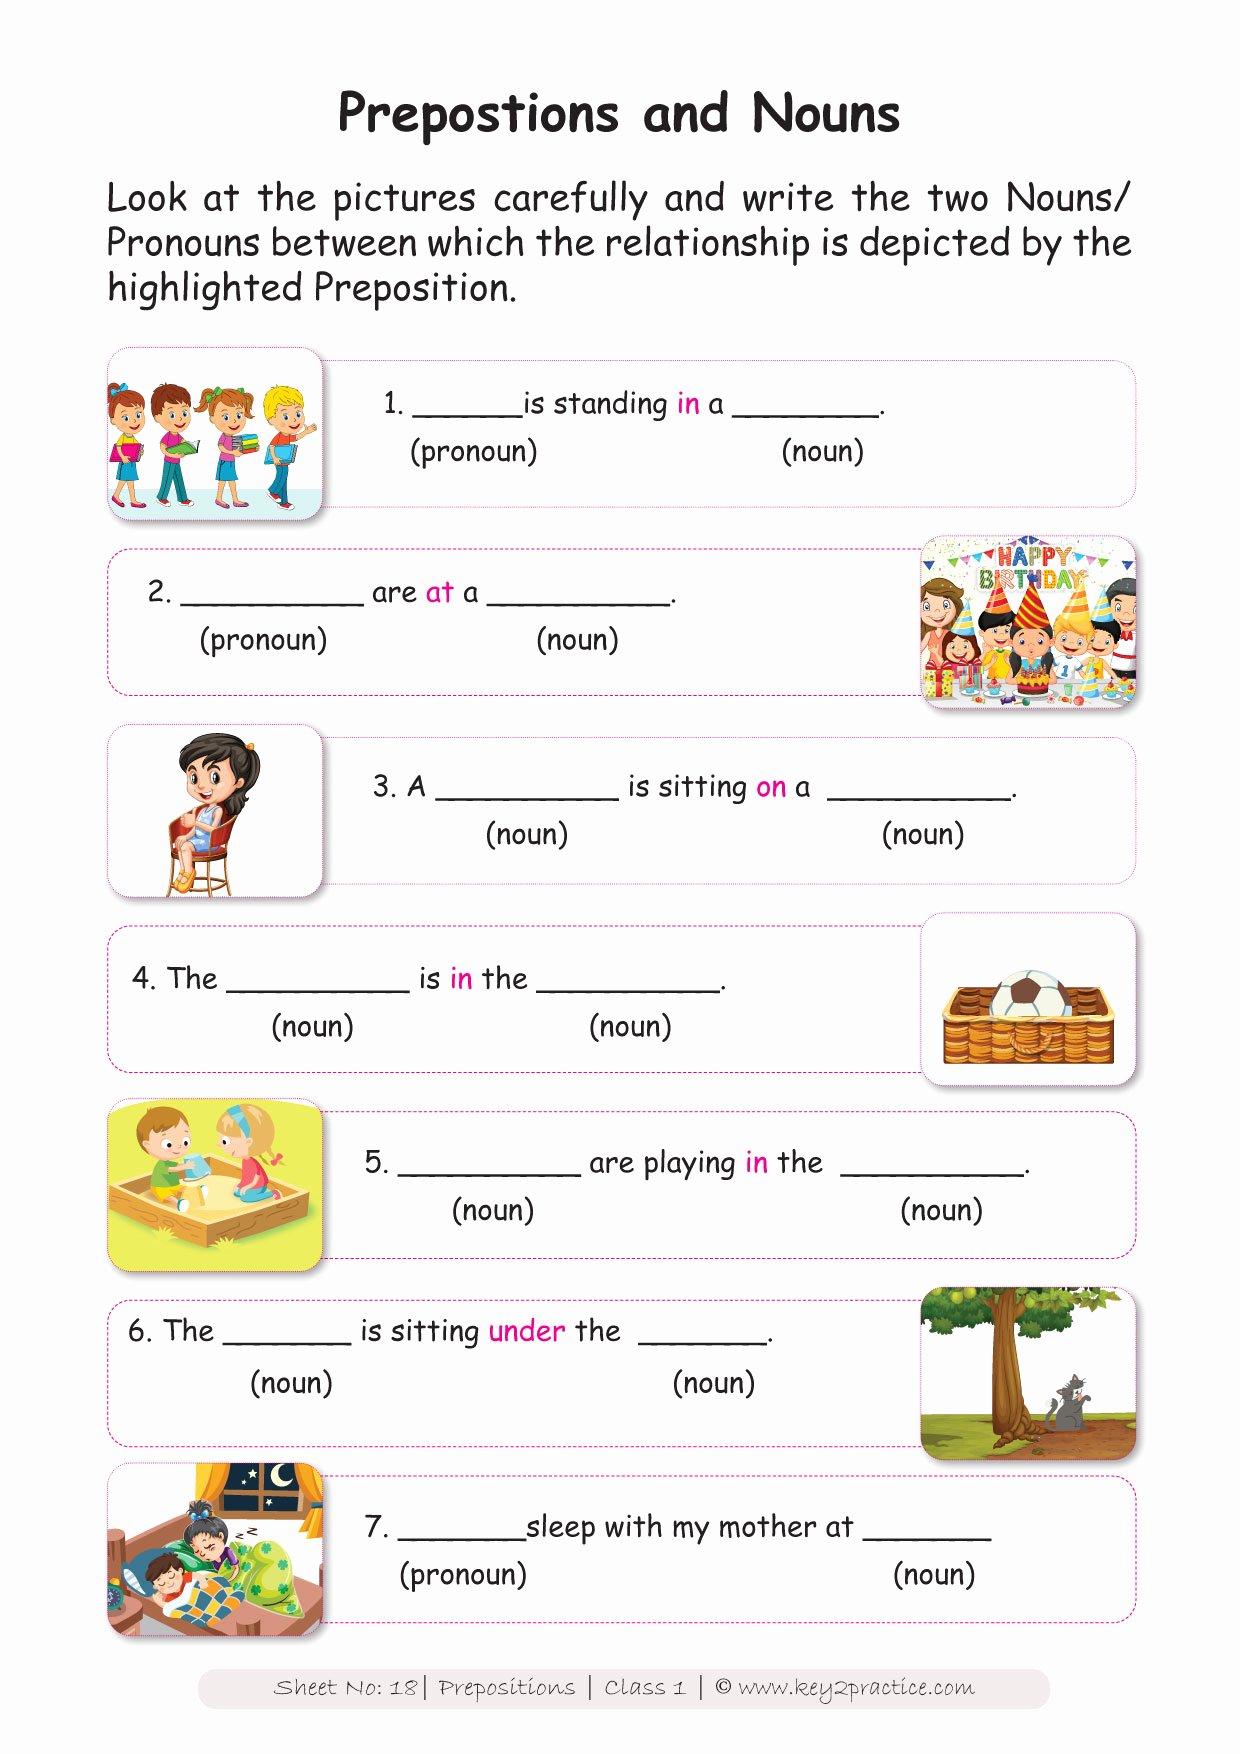 Preposition Worksheets for Grade 1 Inspirational Prepositions Worksheets Grade 1 I English Key2practice Workbooks